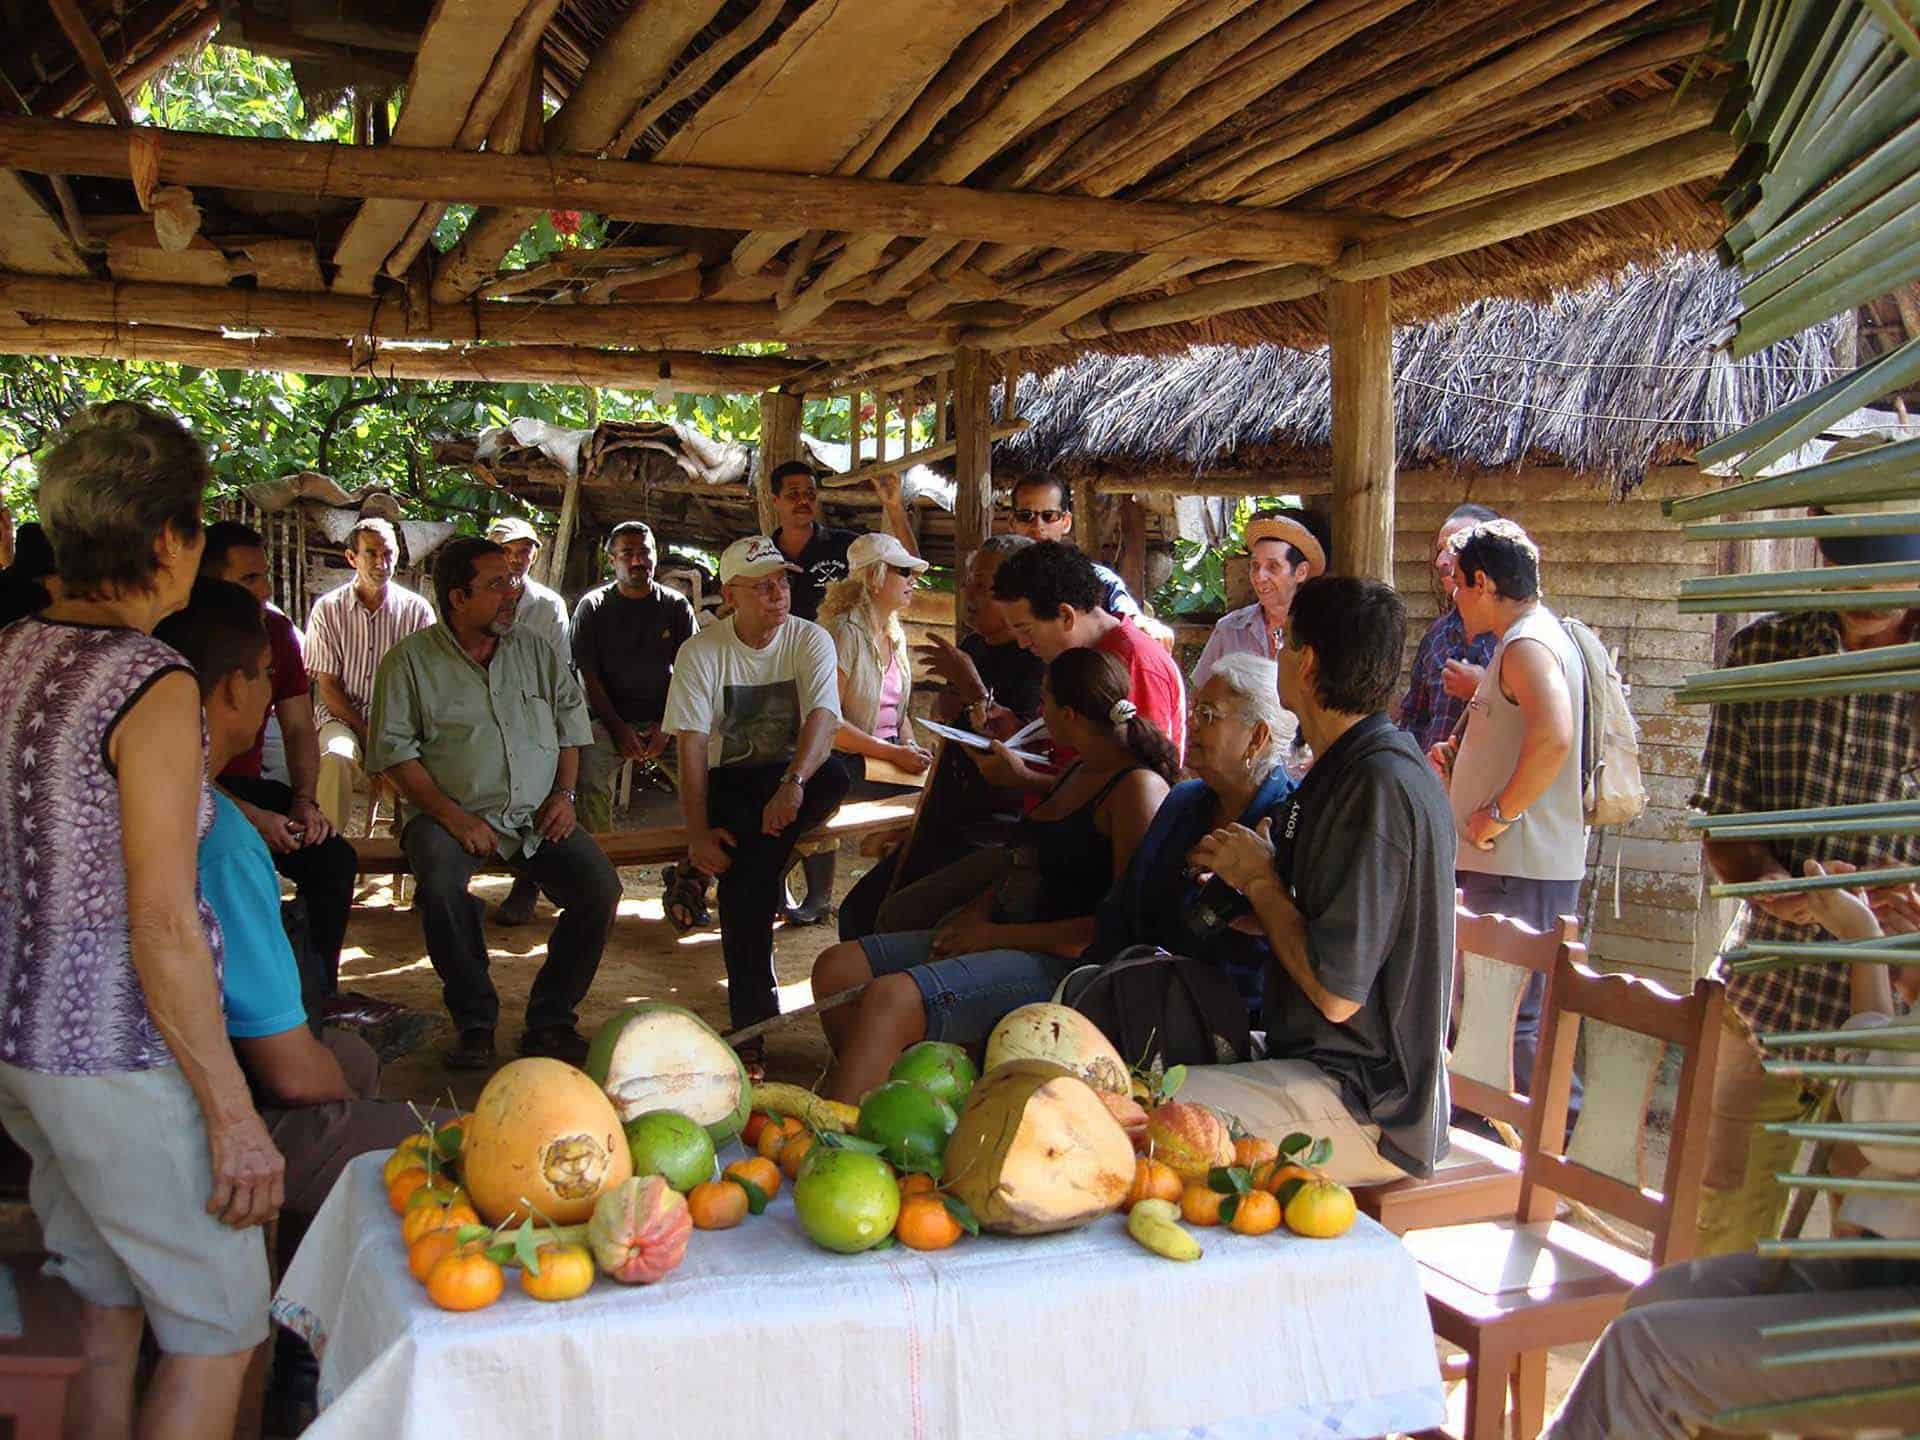 baracoa rencontre cacao fruits cuba autrement